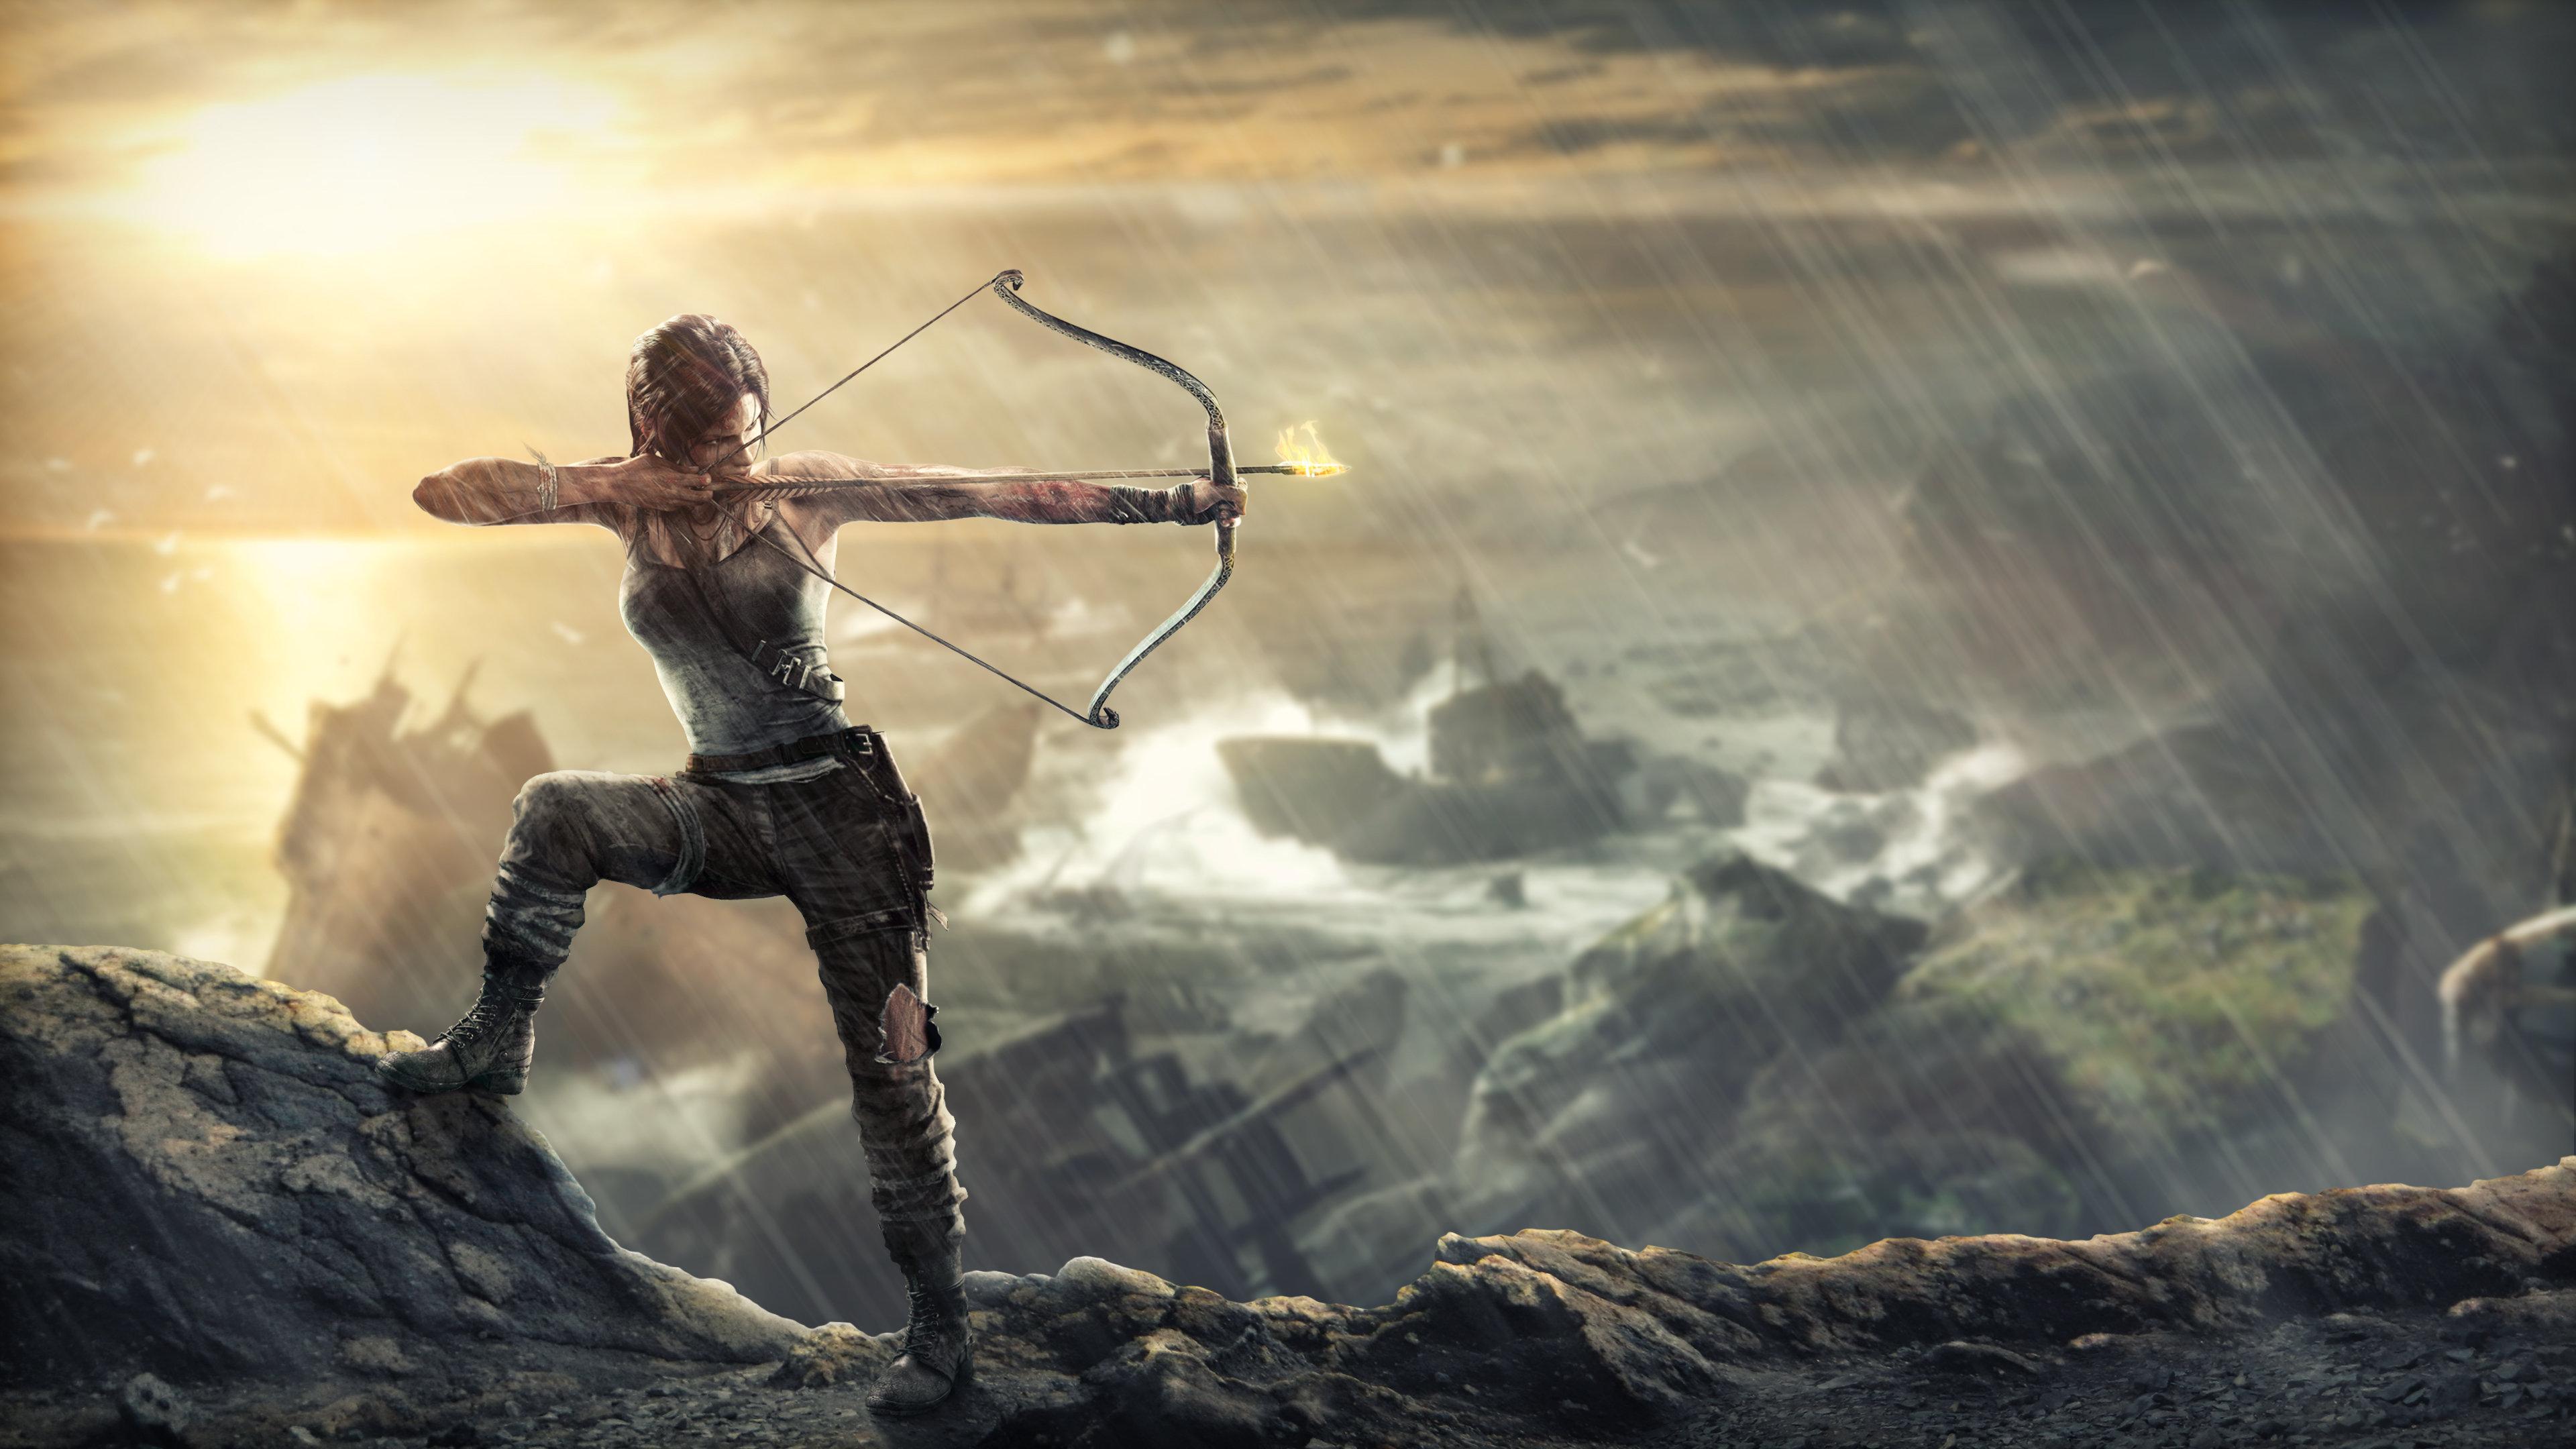 Oblivion 2013 Movie 4k Hd Desktop Wallpaper For 4k Ultra: Tomb Raider (Lara Croft) Wallpapers 3840x2160 Ultra HD 4k